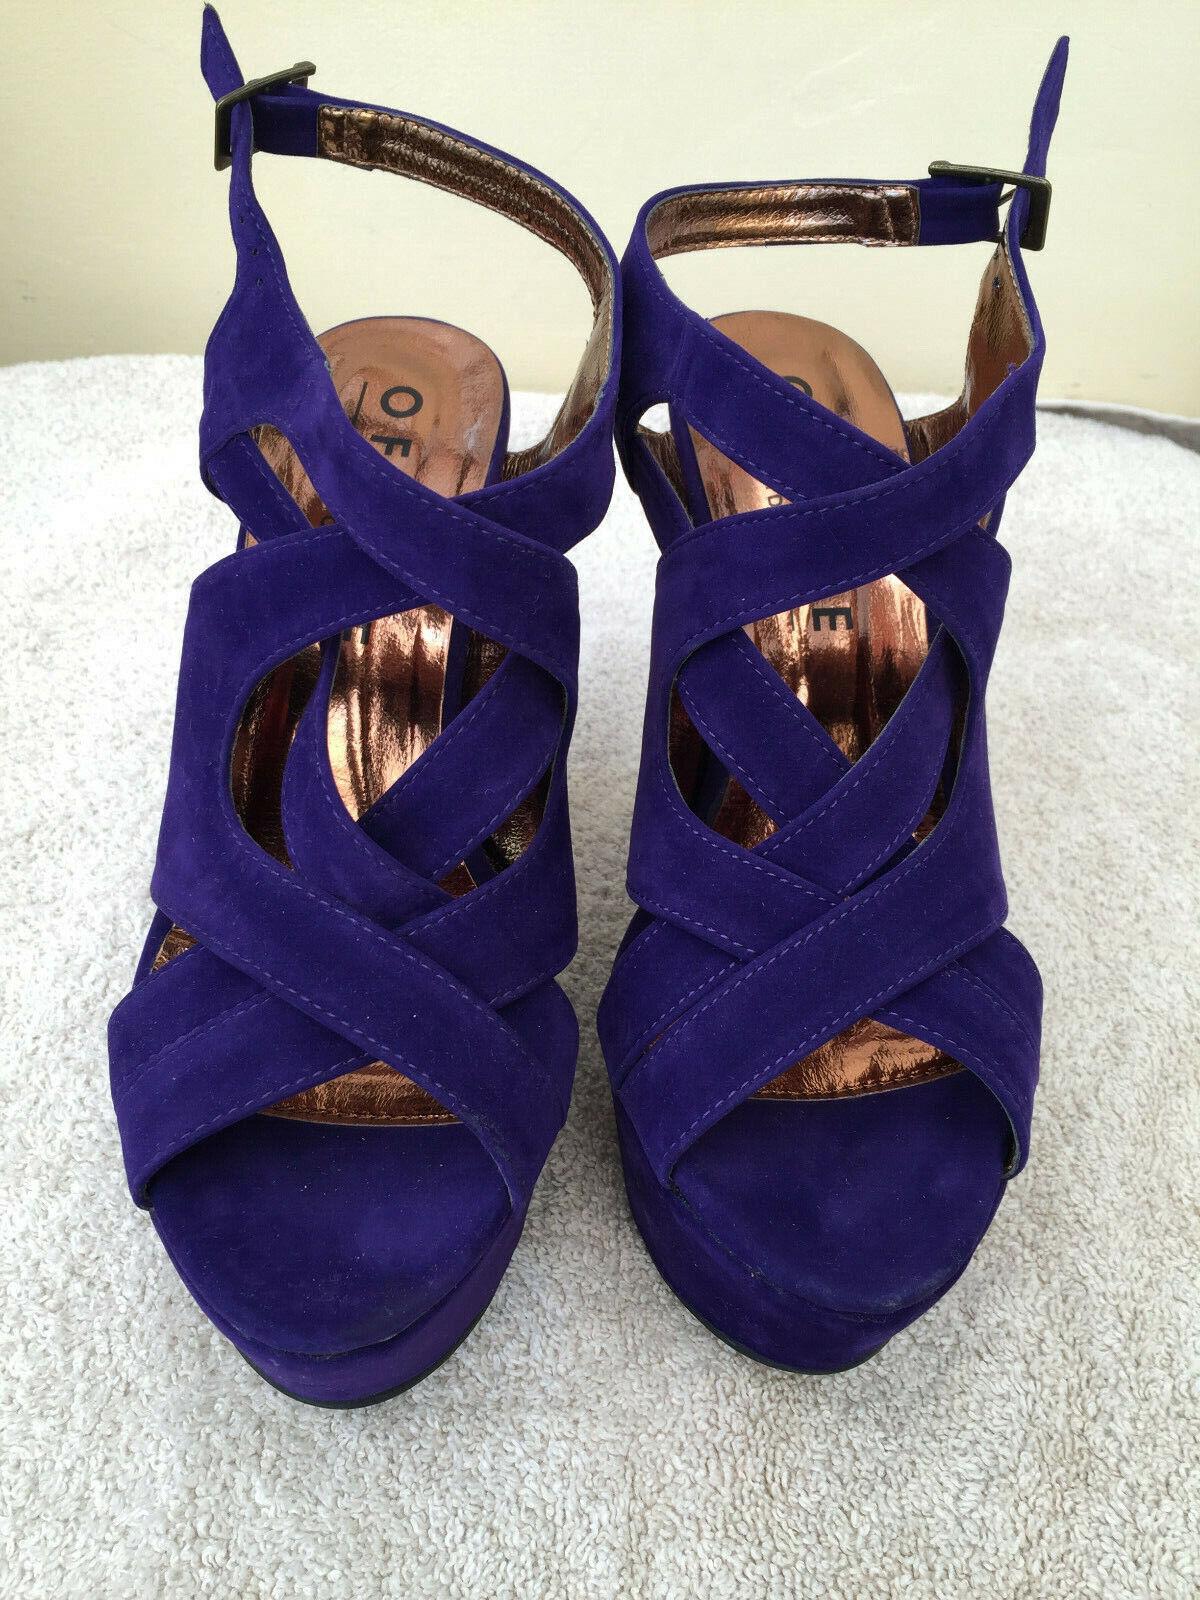 58b90d11ea546 New Unworn Office Purple Suede Sandals Size 3 36 Platform Beautiful ...